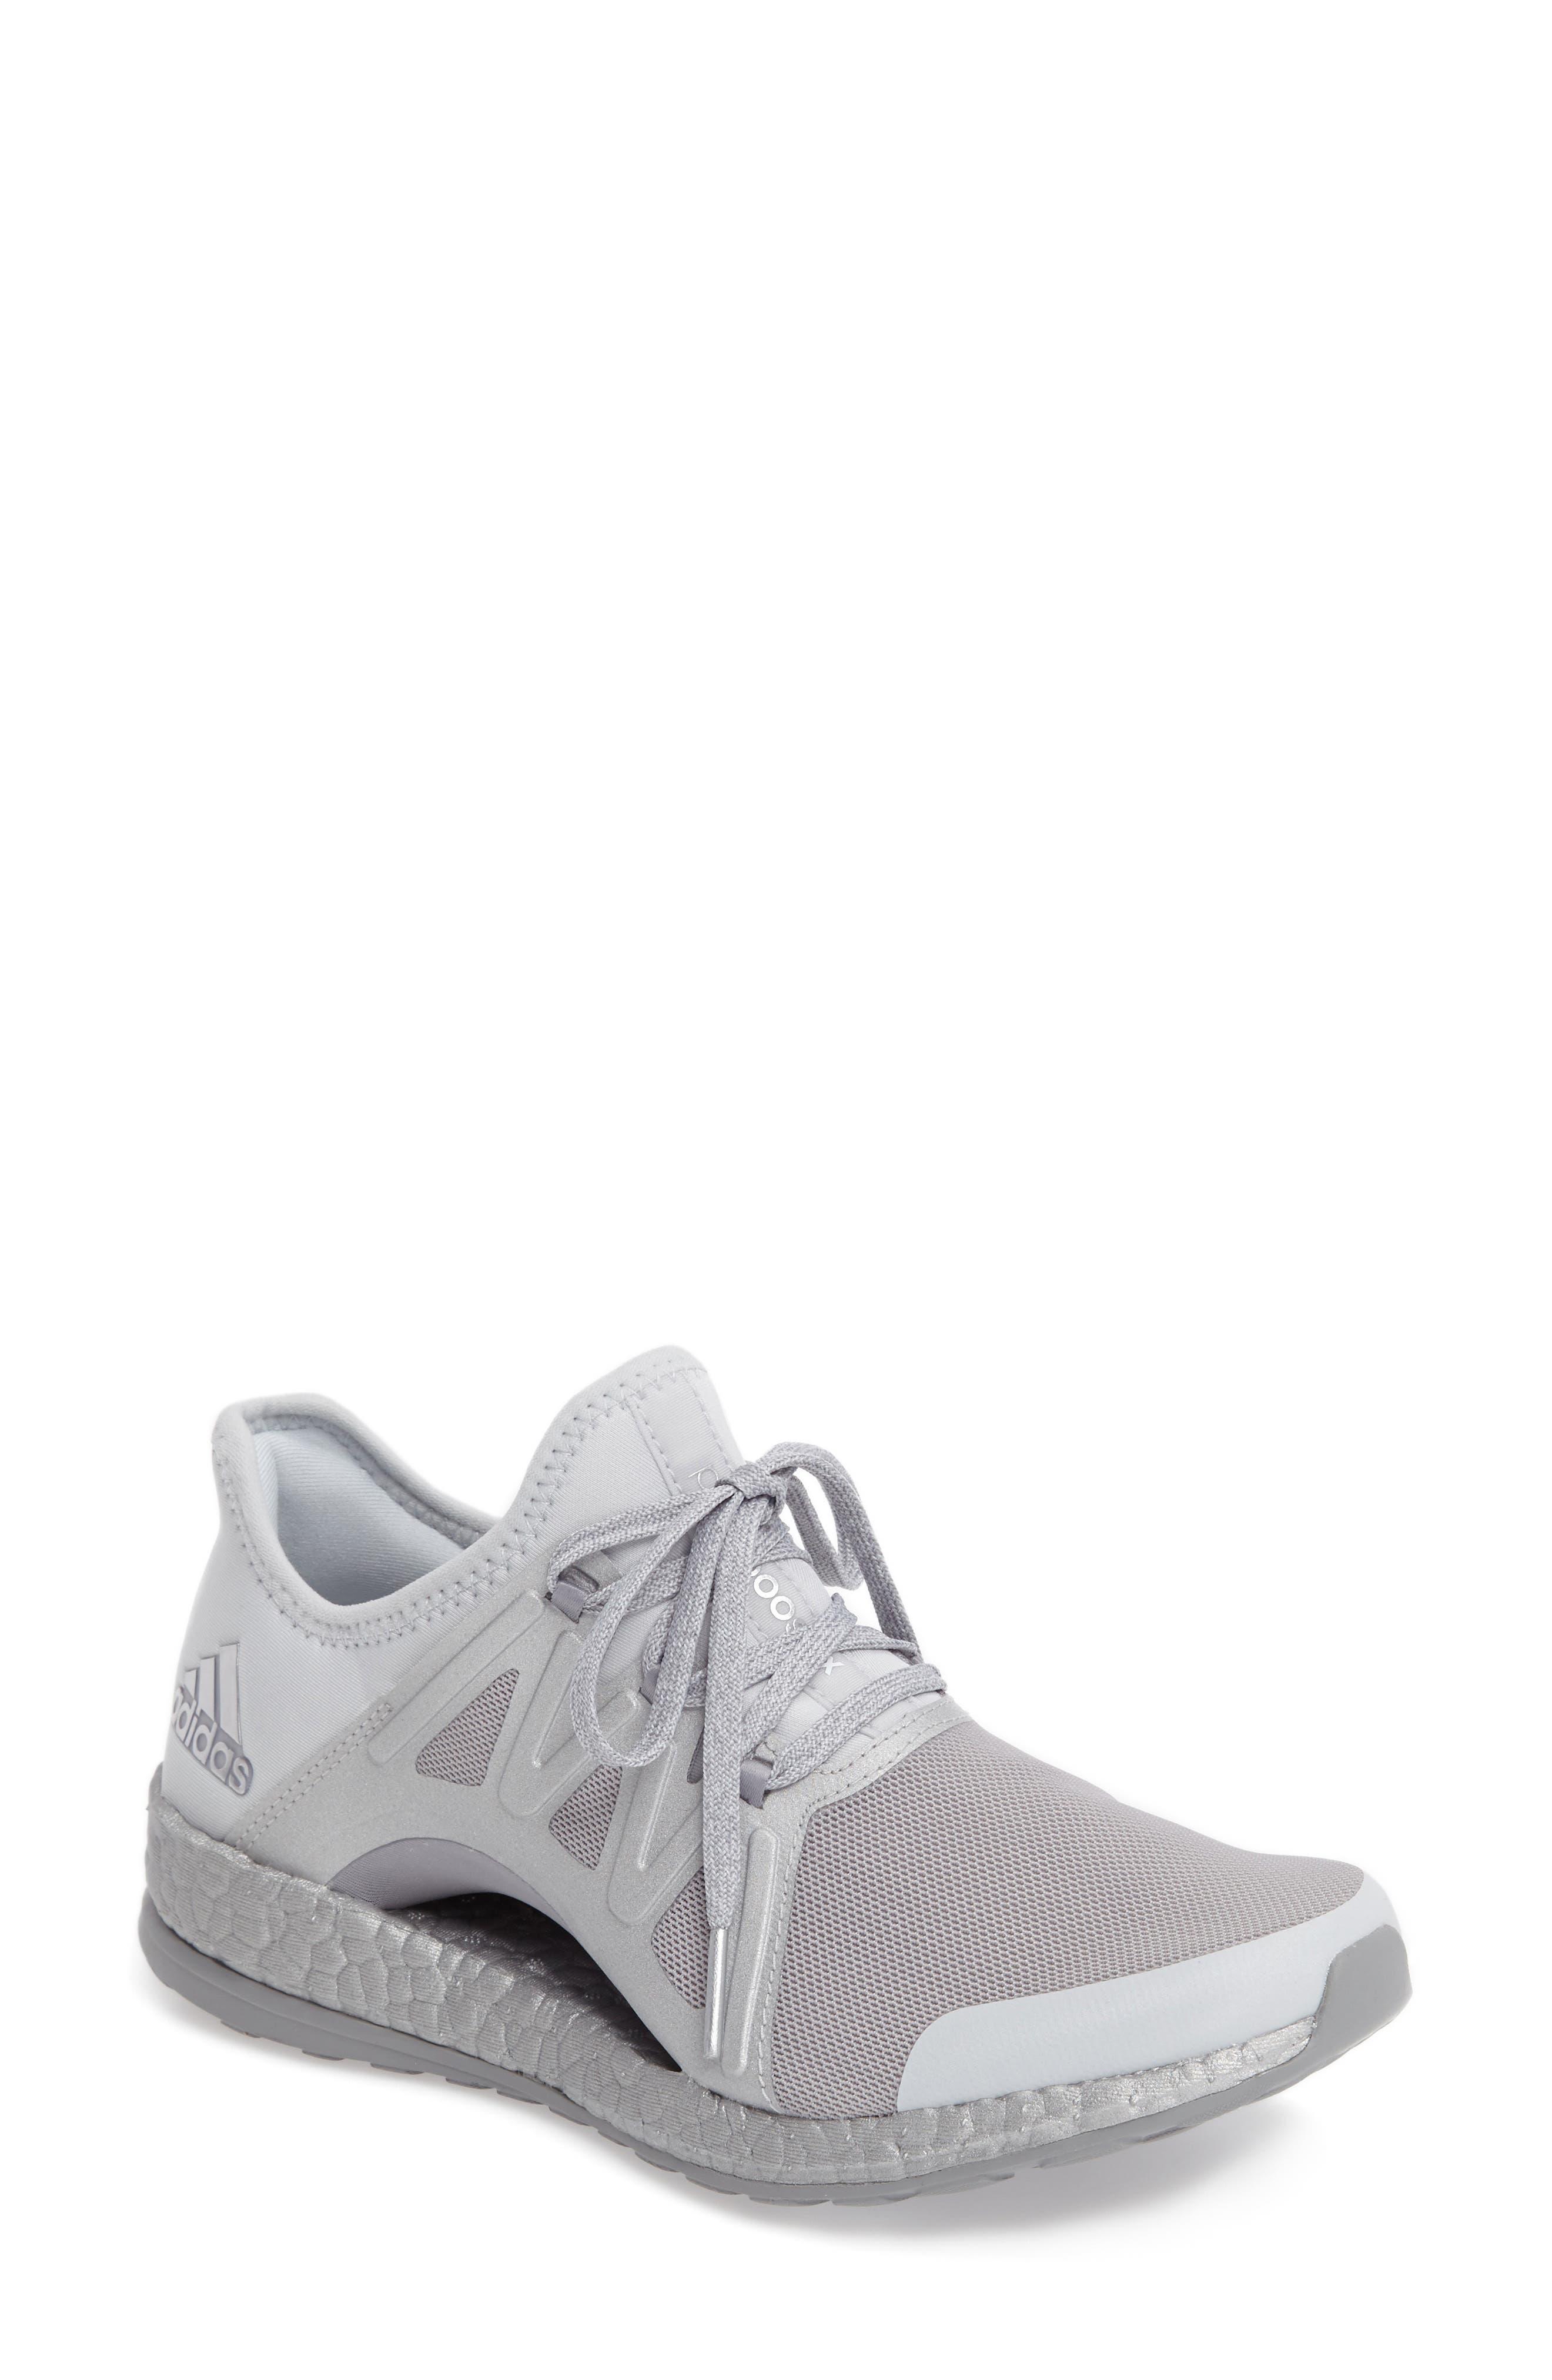 adidas PureBOOST Xpose Running Shoe (Women)